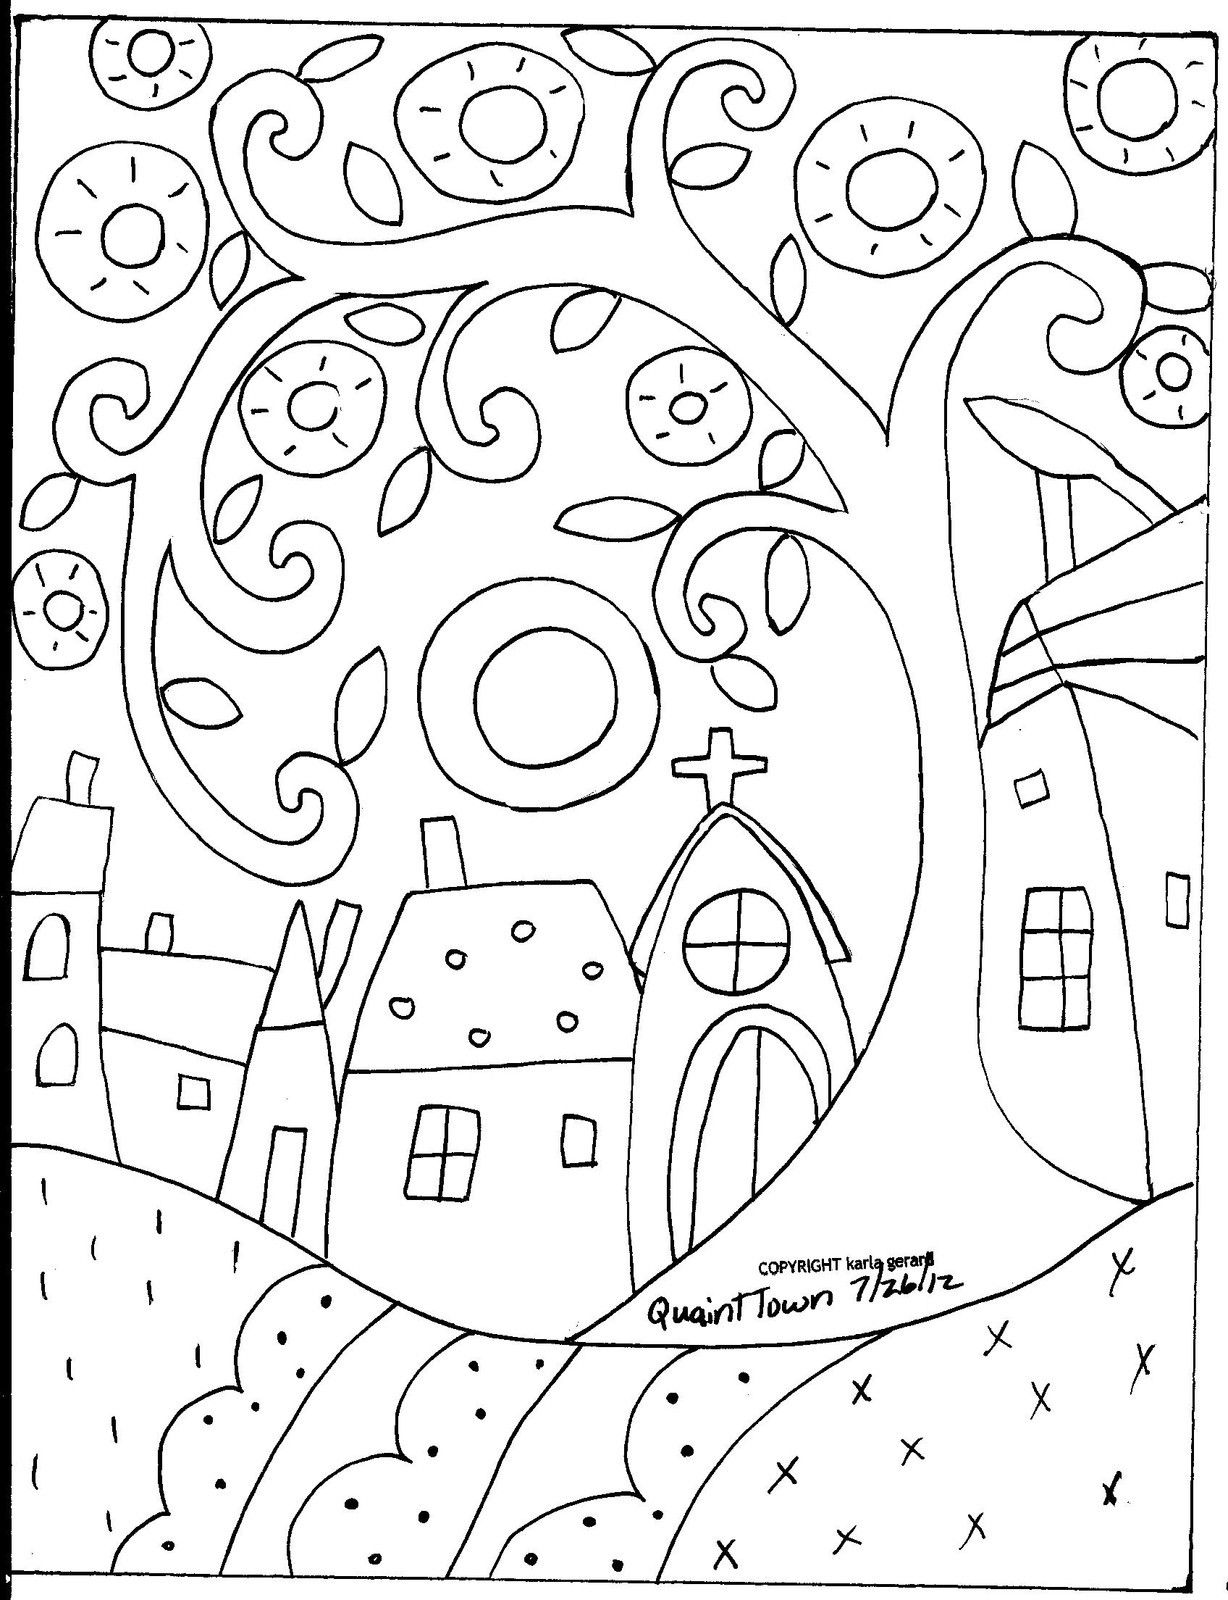 Rug Hooking Paper Pattern Quaint Town Folk Art Modern Primitive Unique Karla G Patrones De Alfombra De Enganche Bordado Popular Bordado De Papel